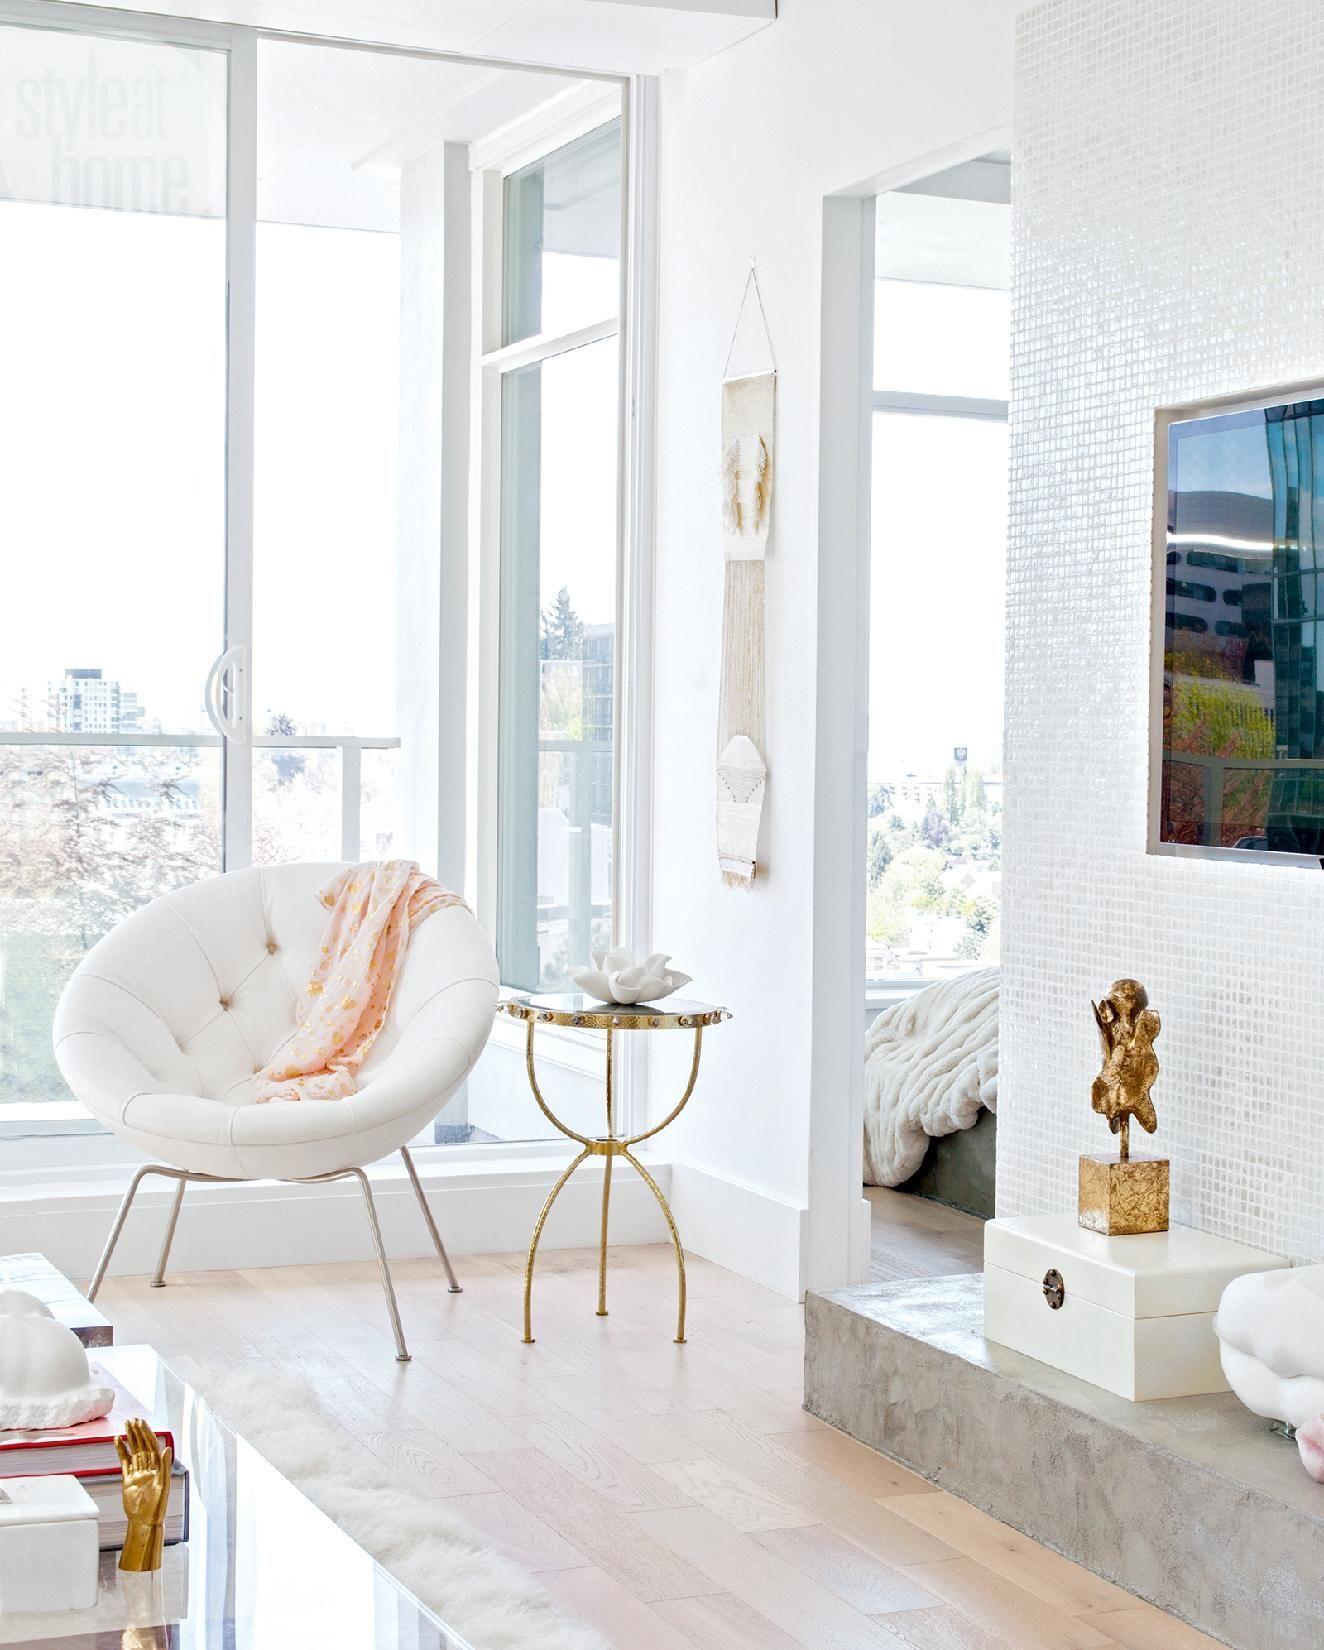 Home Design Ideas For Condos: Condo Tour: Elegant Eclectic Design